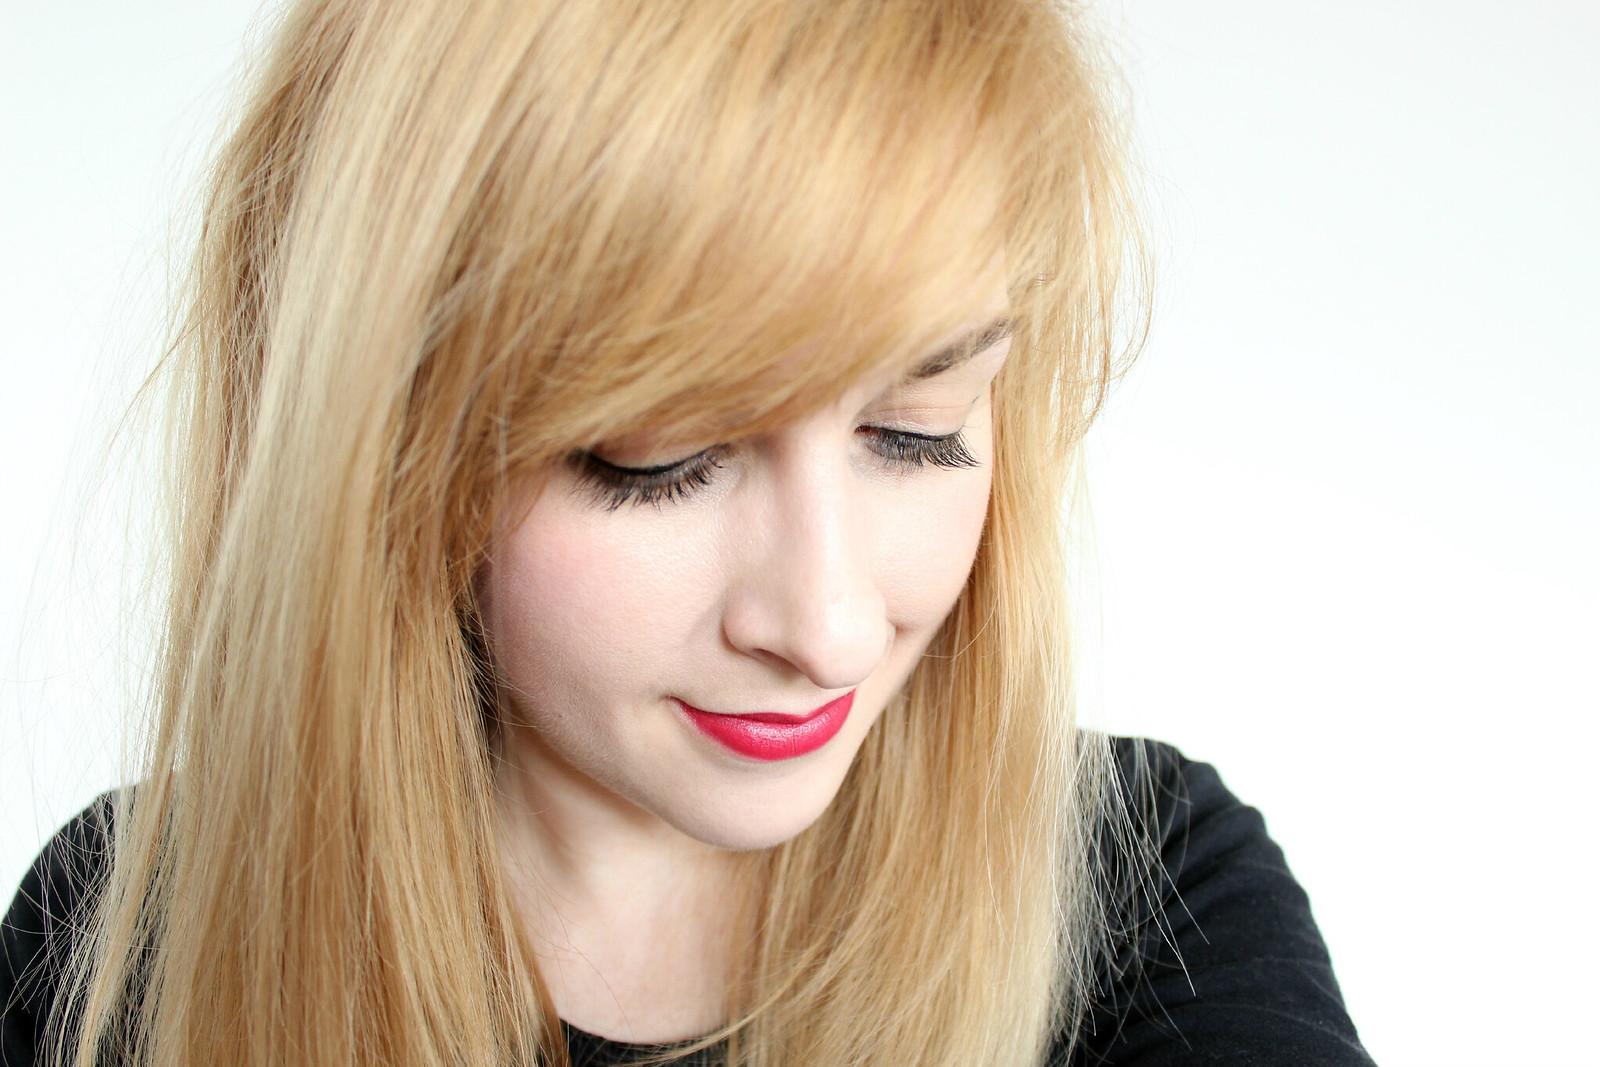 Rimmel Kate 107 Lipstick